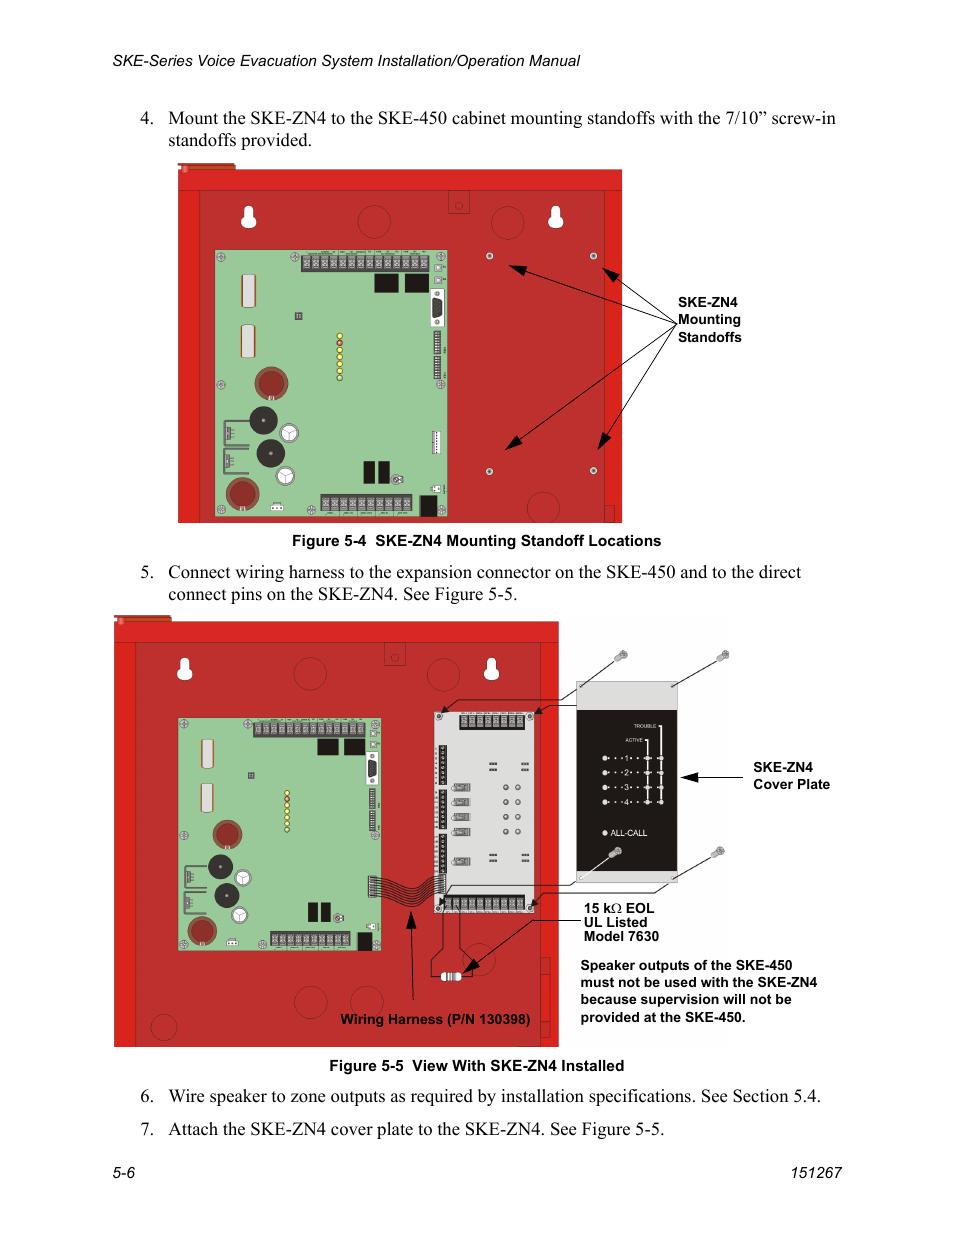 Silentknight Ske 450 Voice Evacuation Control Panel User Manual John Deere 450c Wiring Harness Page 40 76